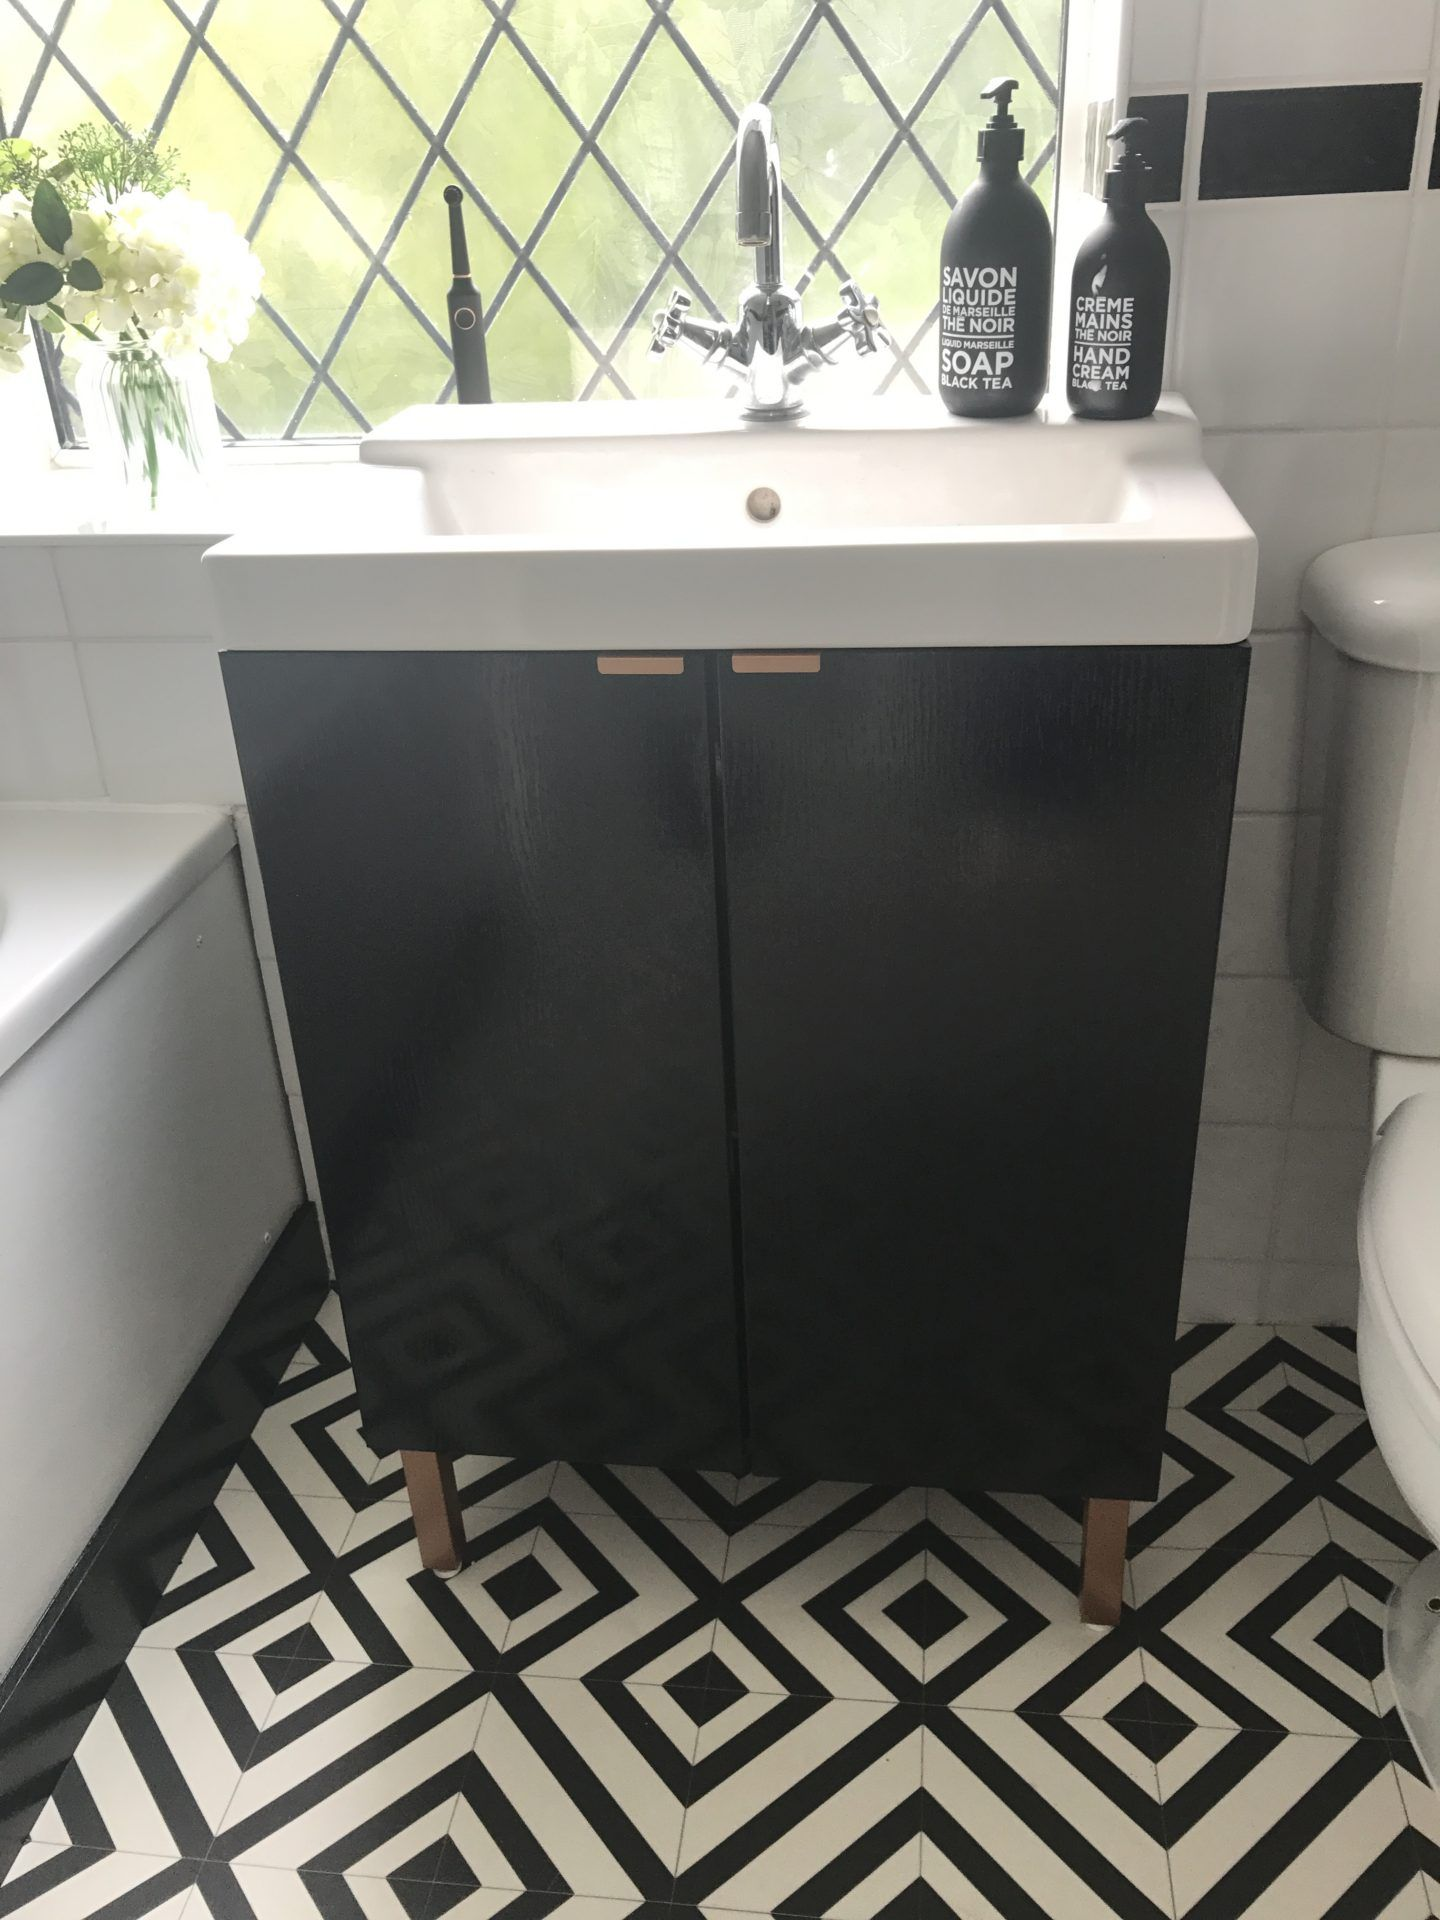 Diy Ikea Hack Bathroom Sink Cupboard Lillangen Wash Basin Black Paint And Spray Painted Legs Ikea Hack Bathroom Ikea Vanity Trendy Bathroom